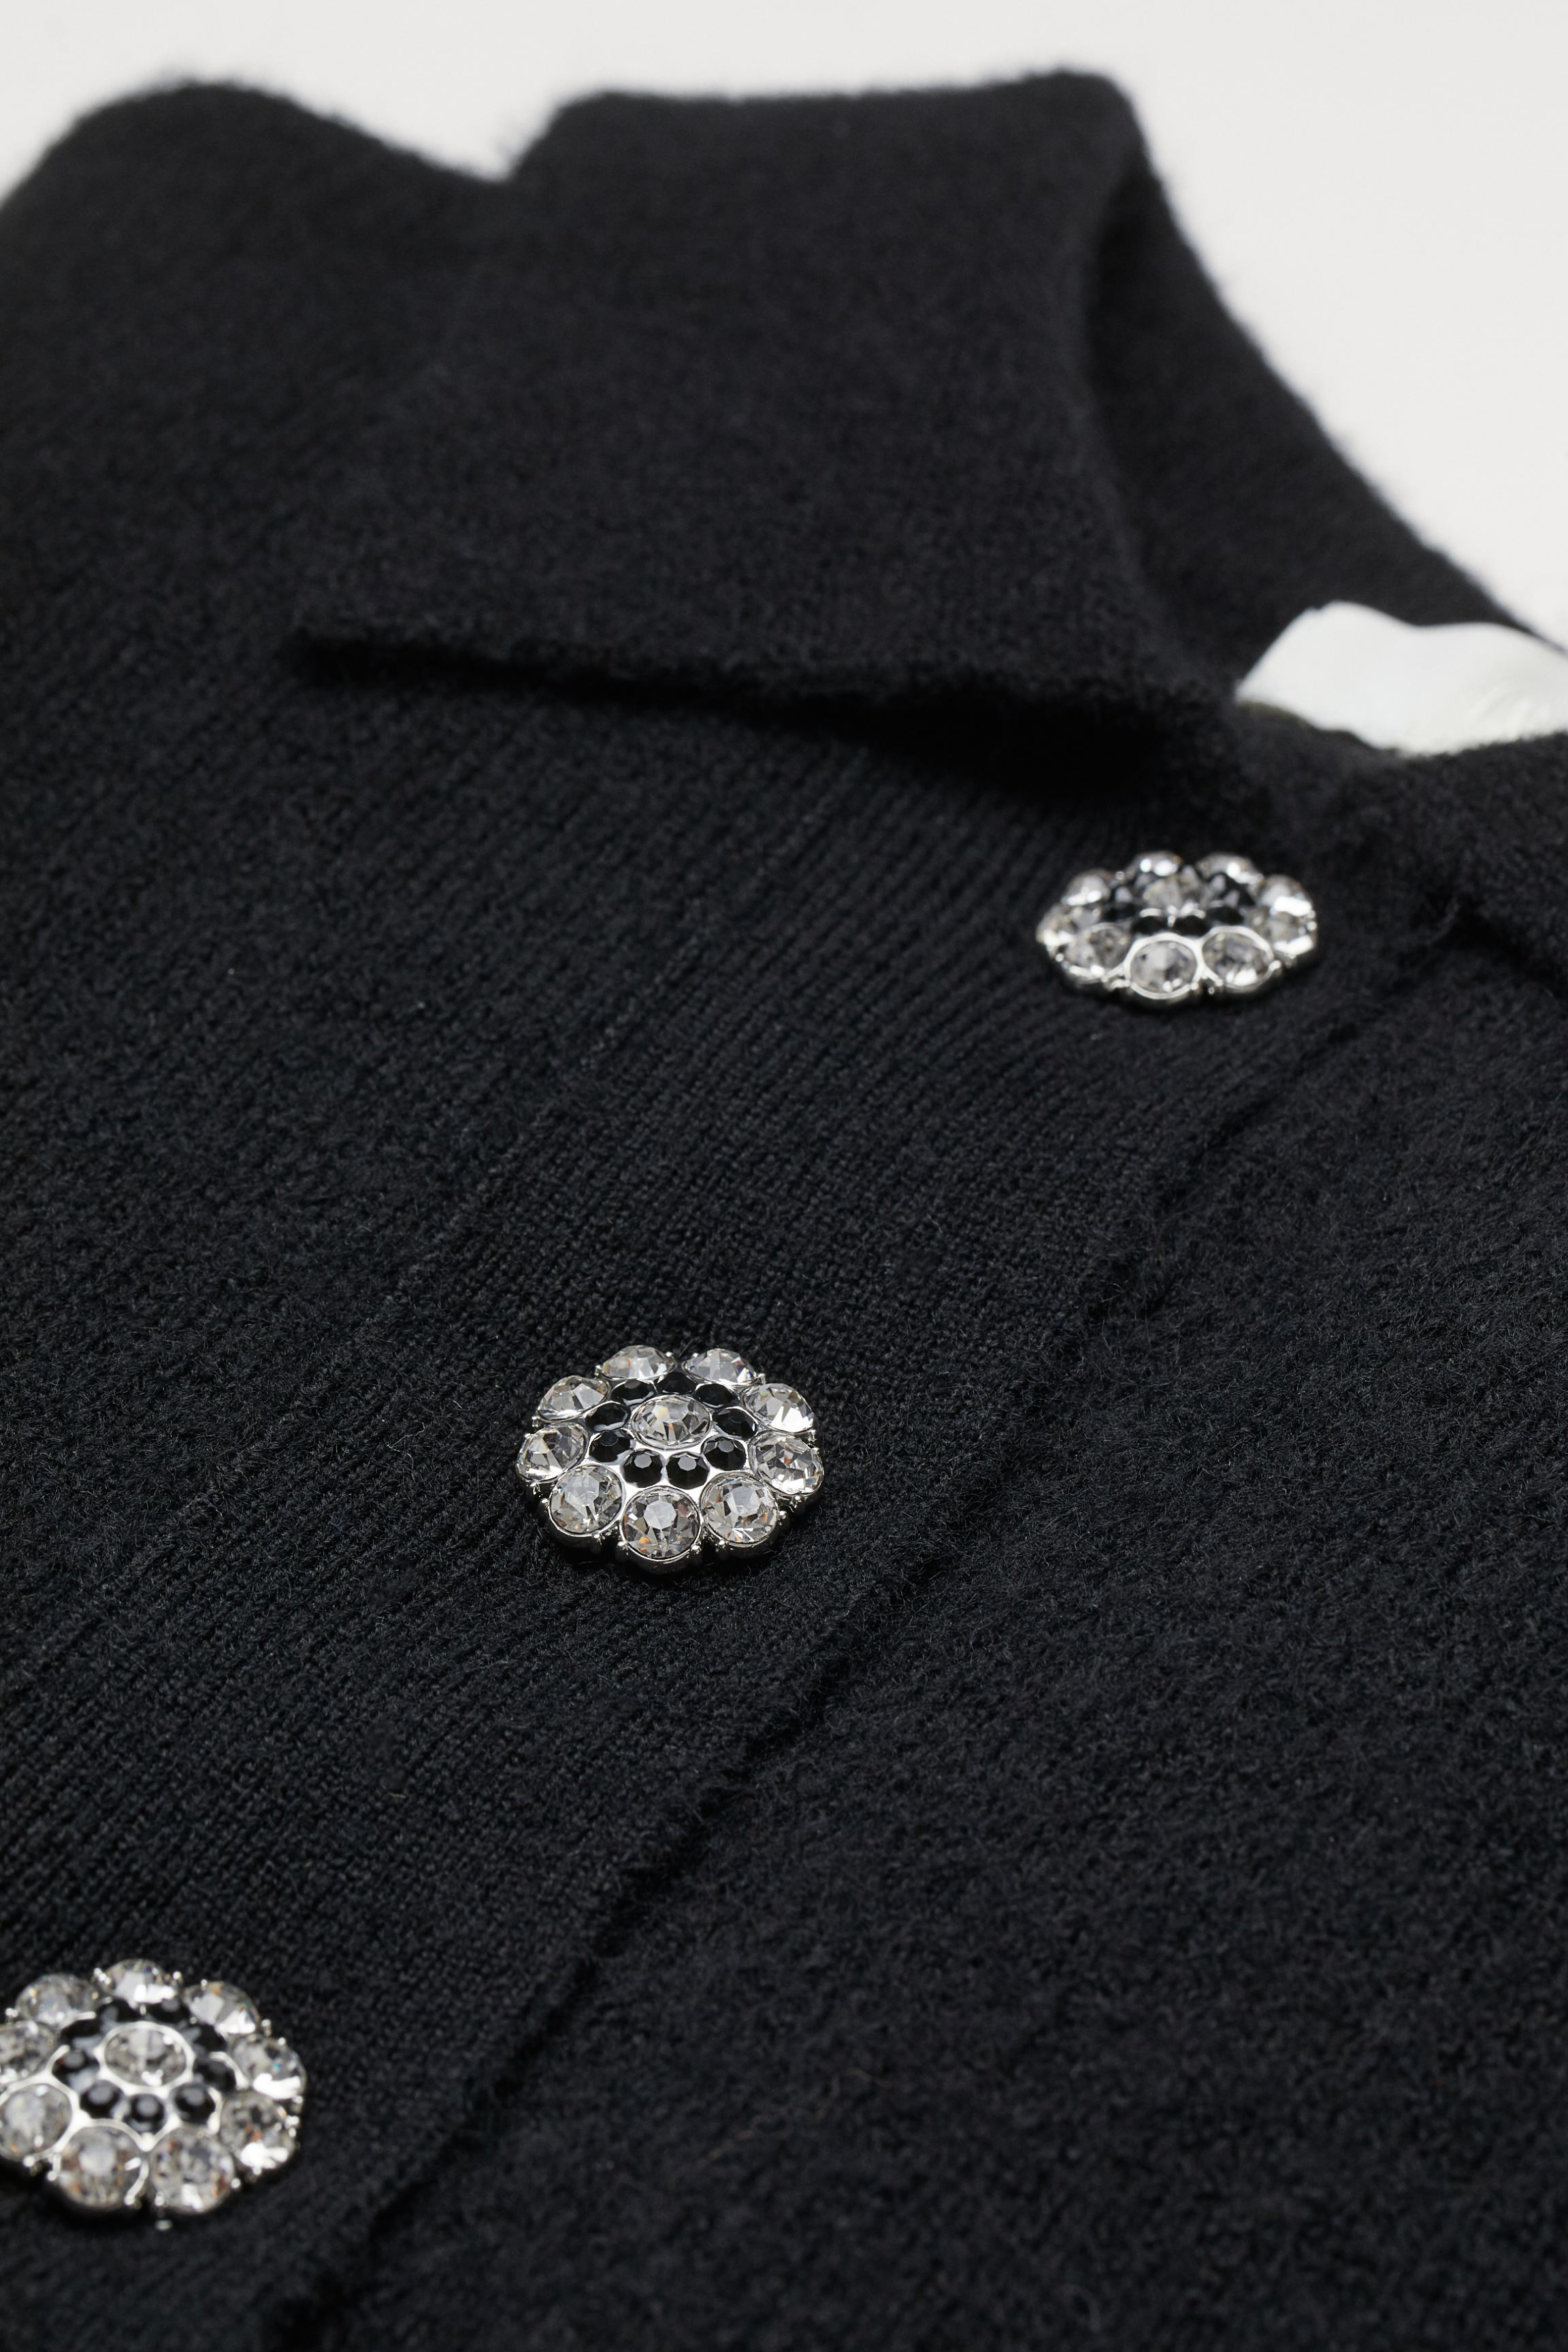 Fine-knit Top